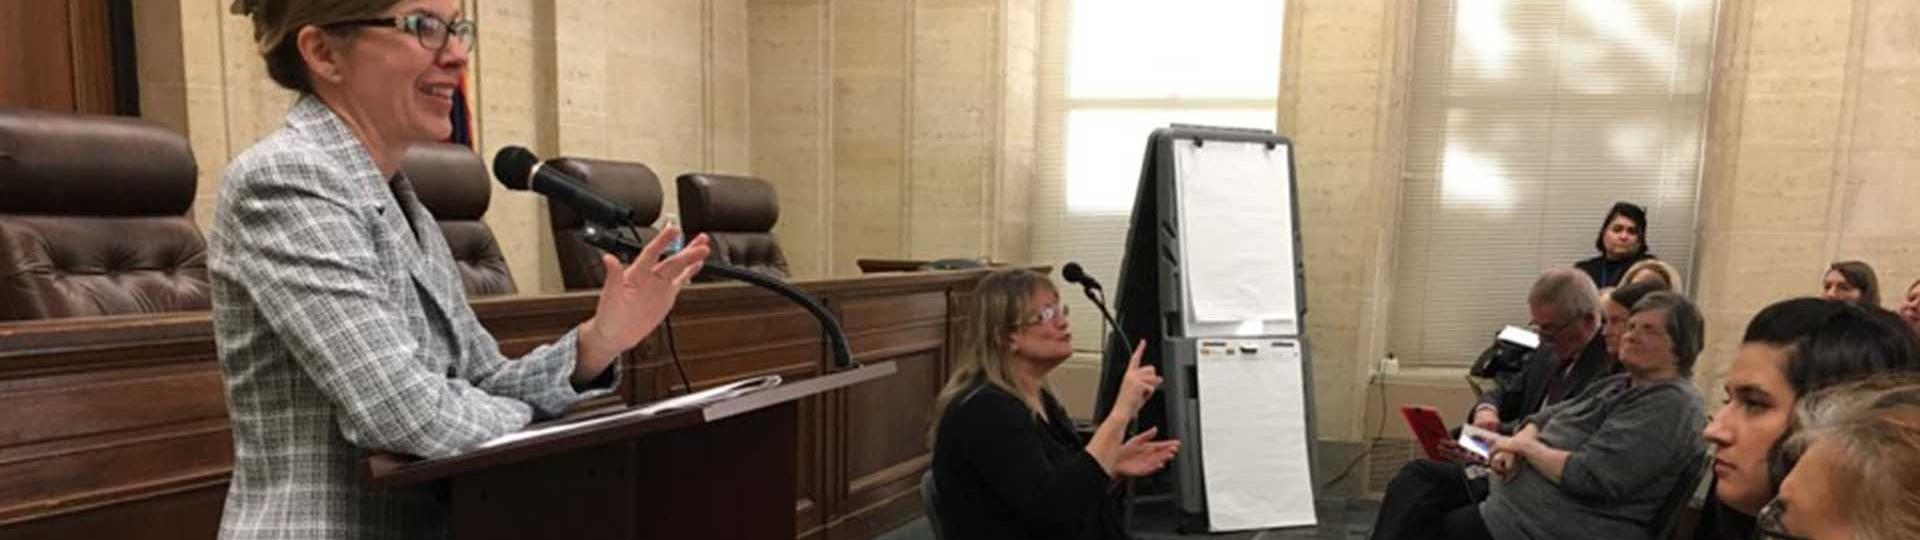 ADDPC_0015_Erica McFadden speaks at Legislative Forum Jan 2019.jpg